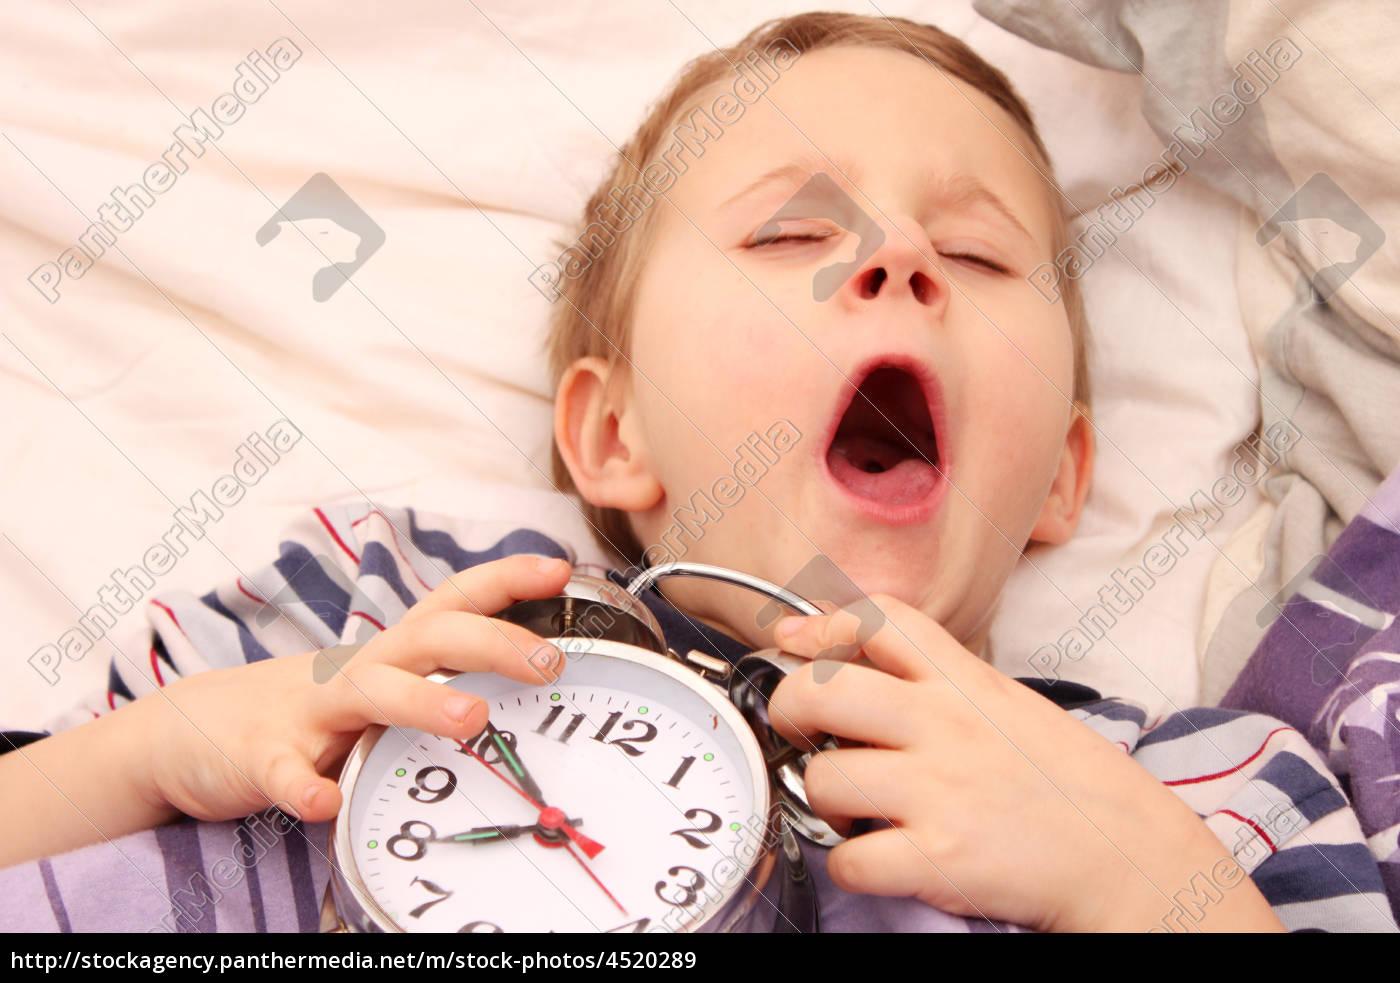 hora, de, dormir - 4520289